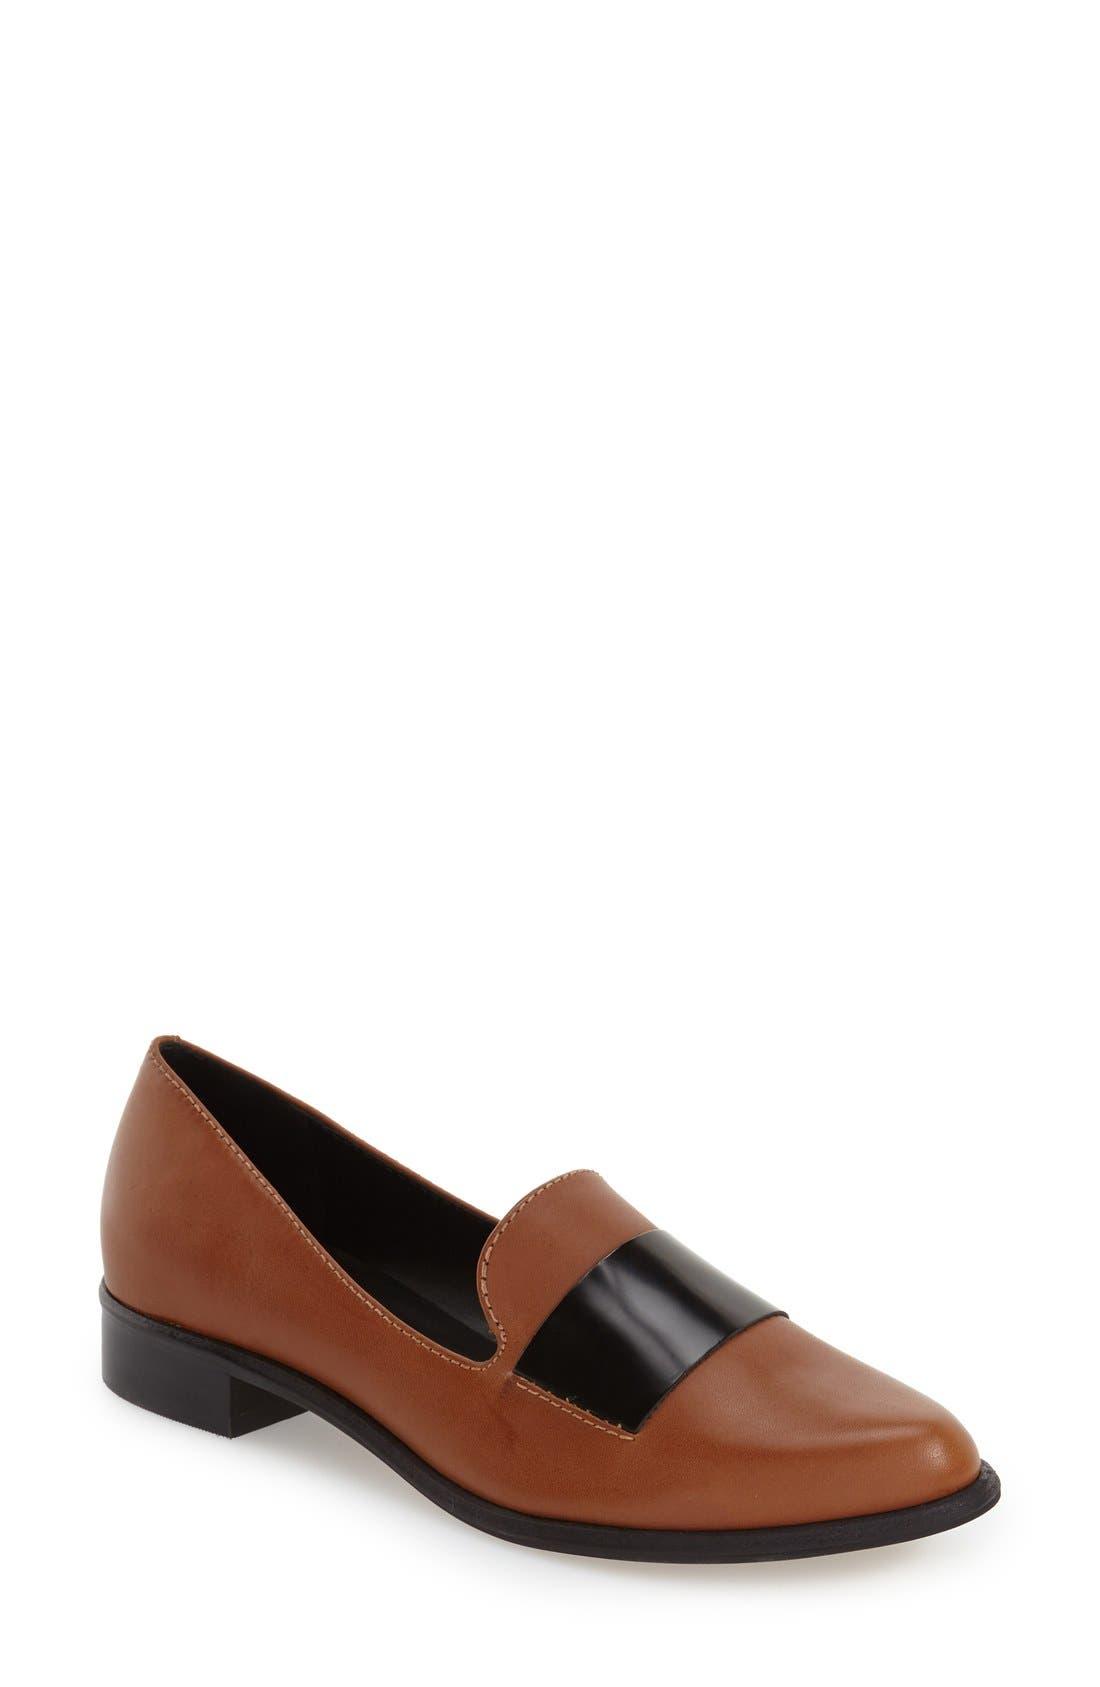 M4D3 'Ocean' Flat Loafer,                             Main thumbnail 5, color,